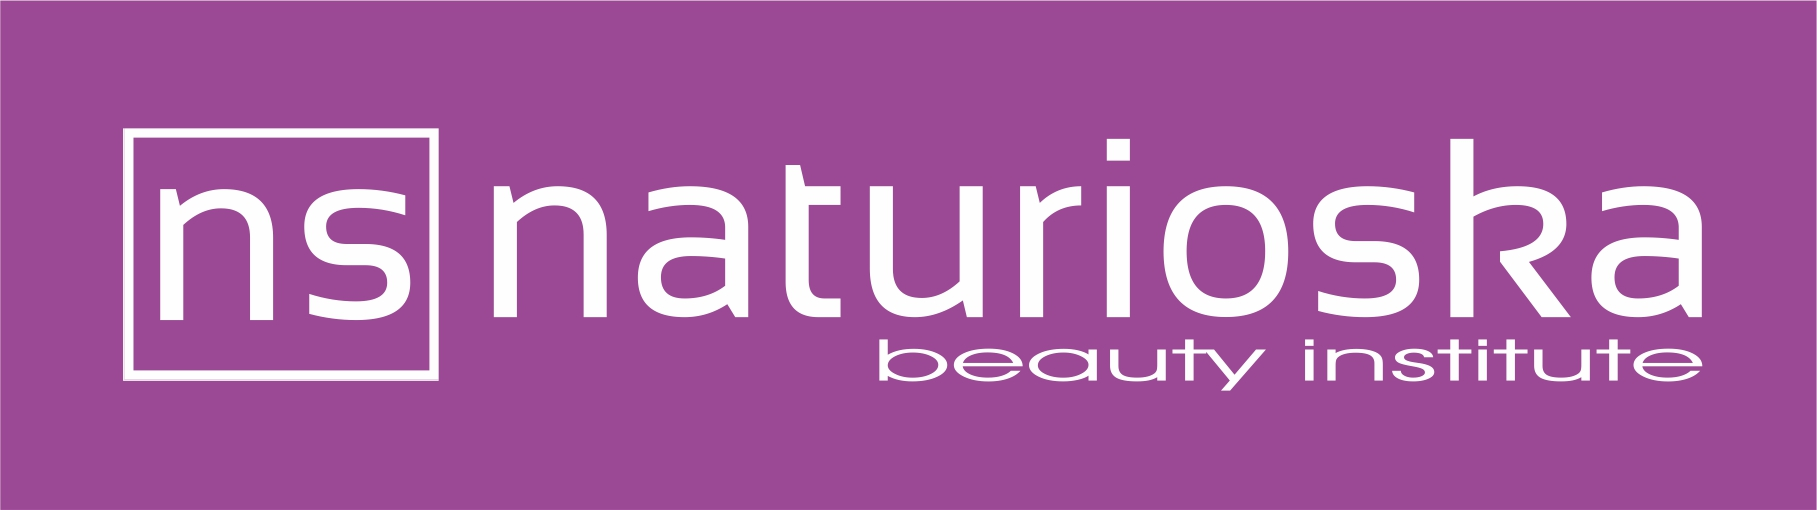 logo_naturioska_beauty_institute_fiolet_tlo_2